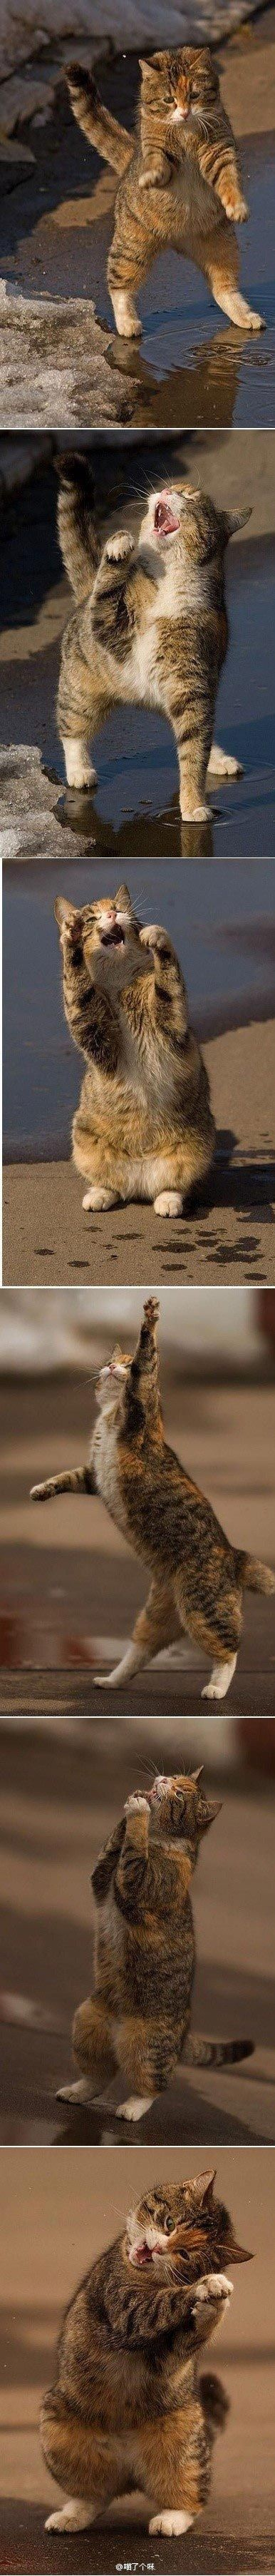 Kitty has got all the right moves! So true !